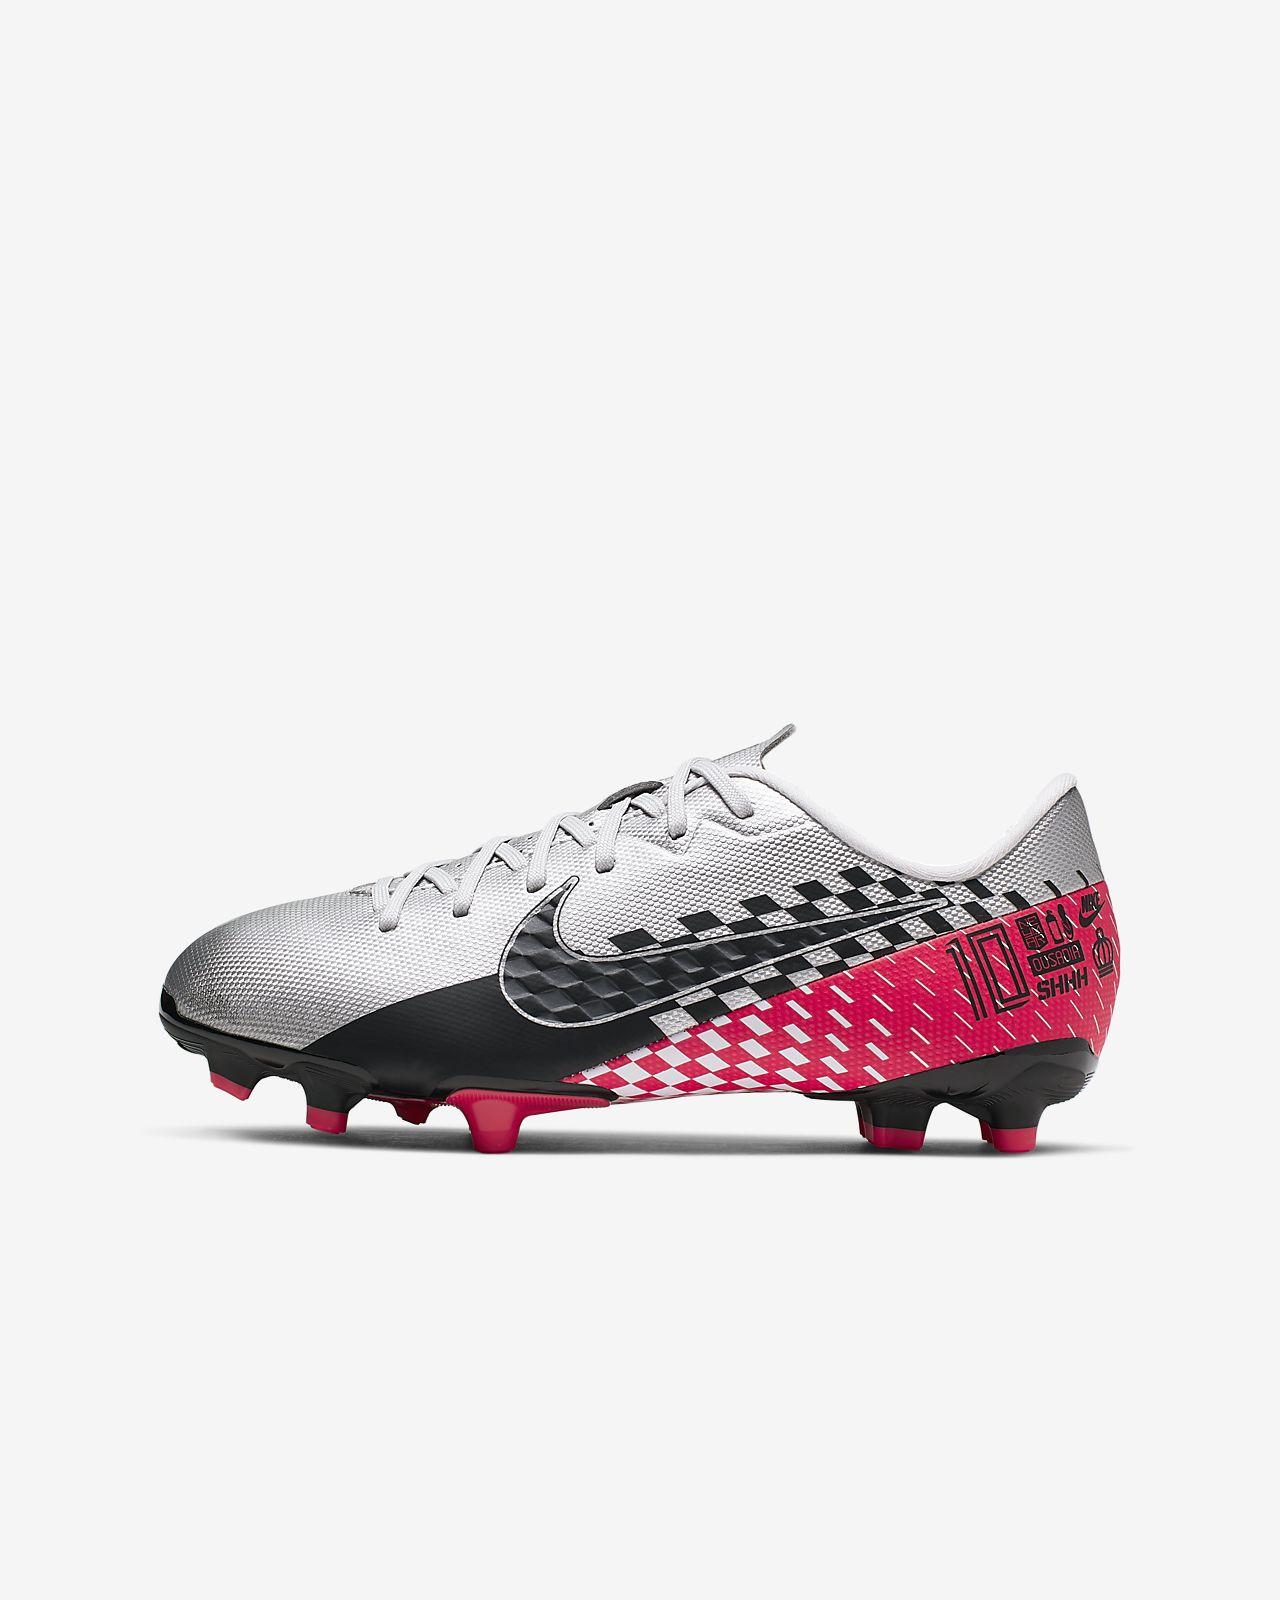 Nike Jr. Mercurial Vapor 13 Academy Neymar Jr. MG Botas de fútbol para múltiples superficies - Niño/a